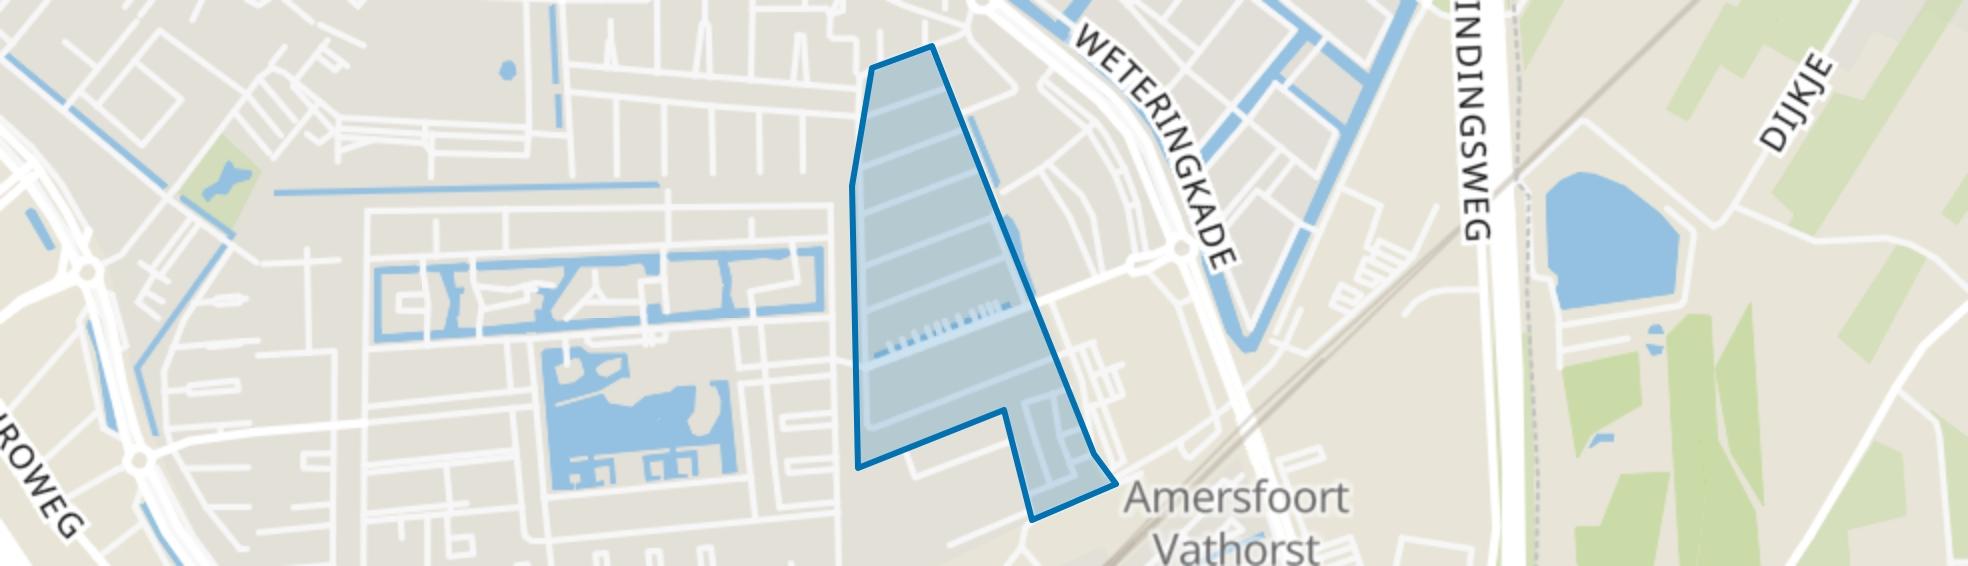 Damespolder, Amersfoort map